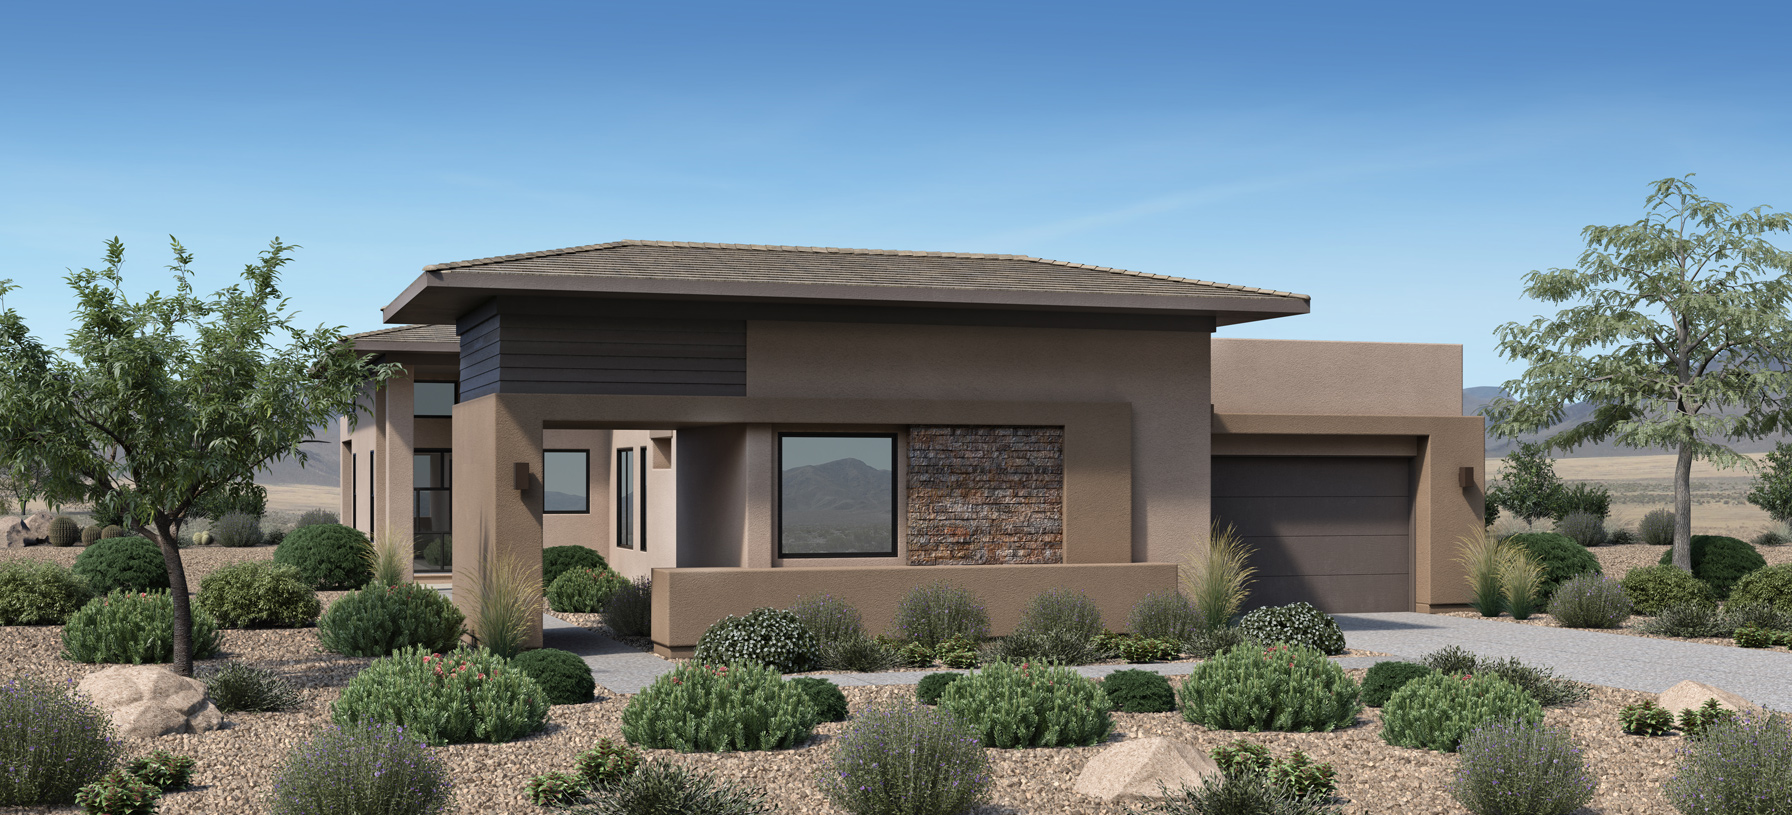 Pacifica -  Desert Contemporary